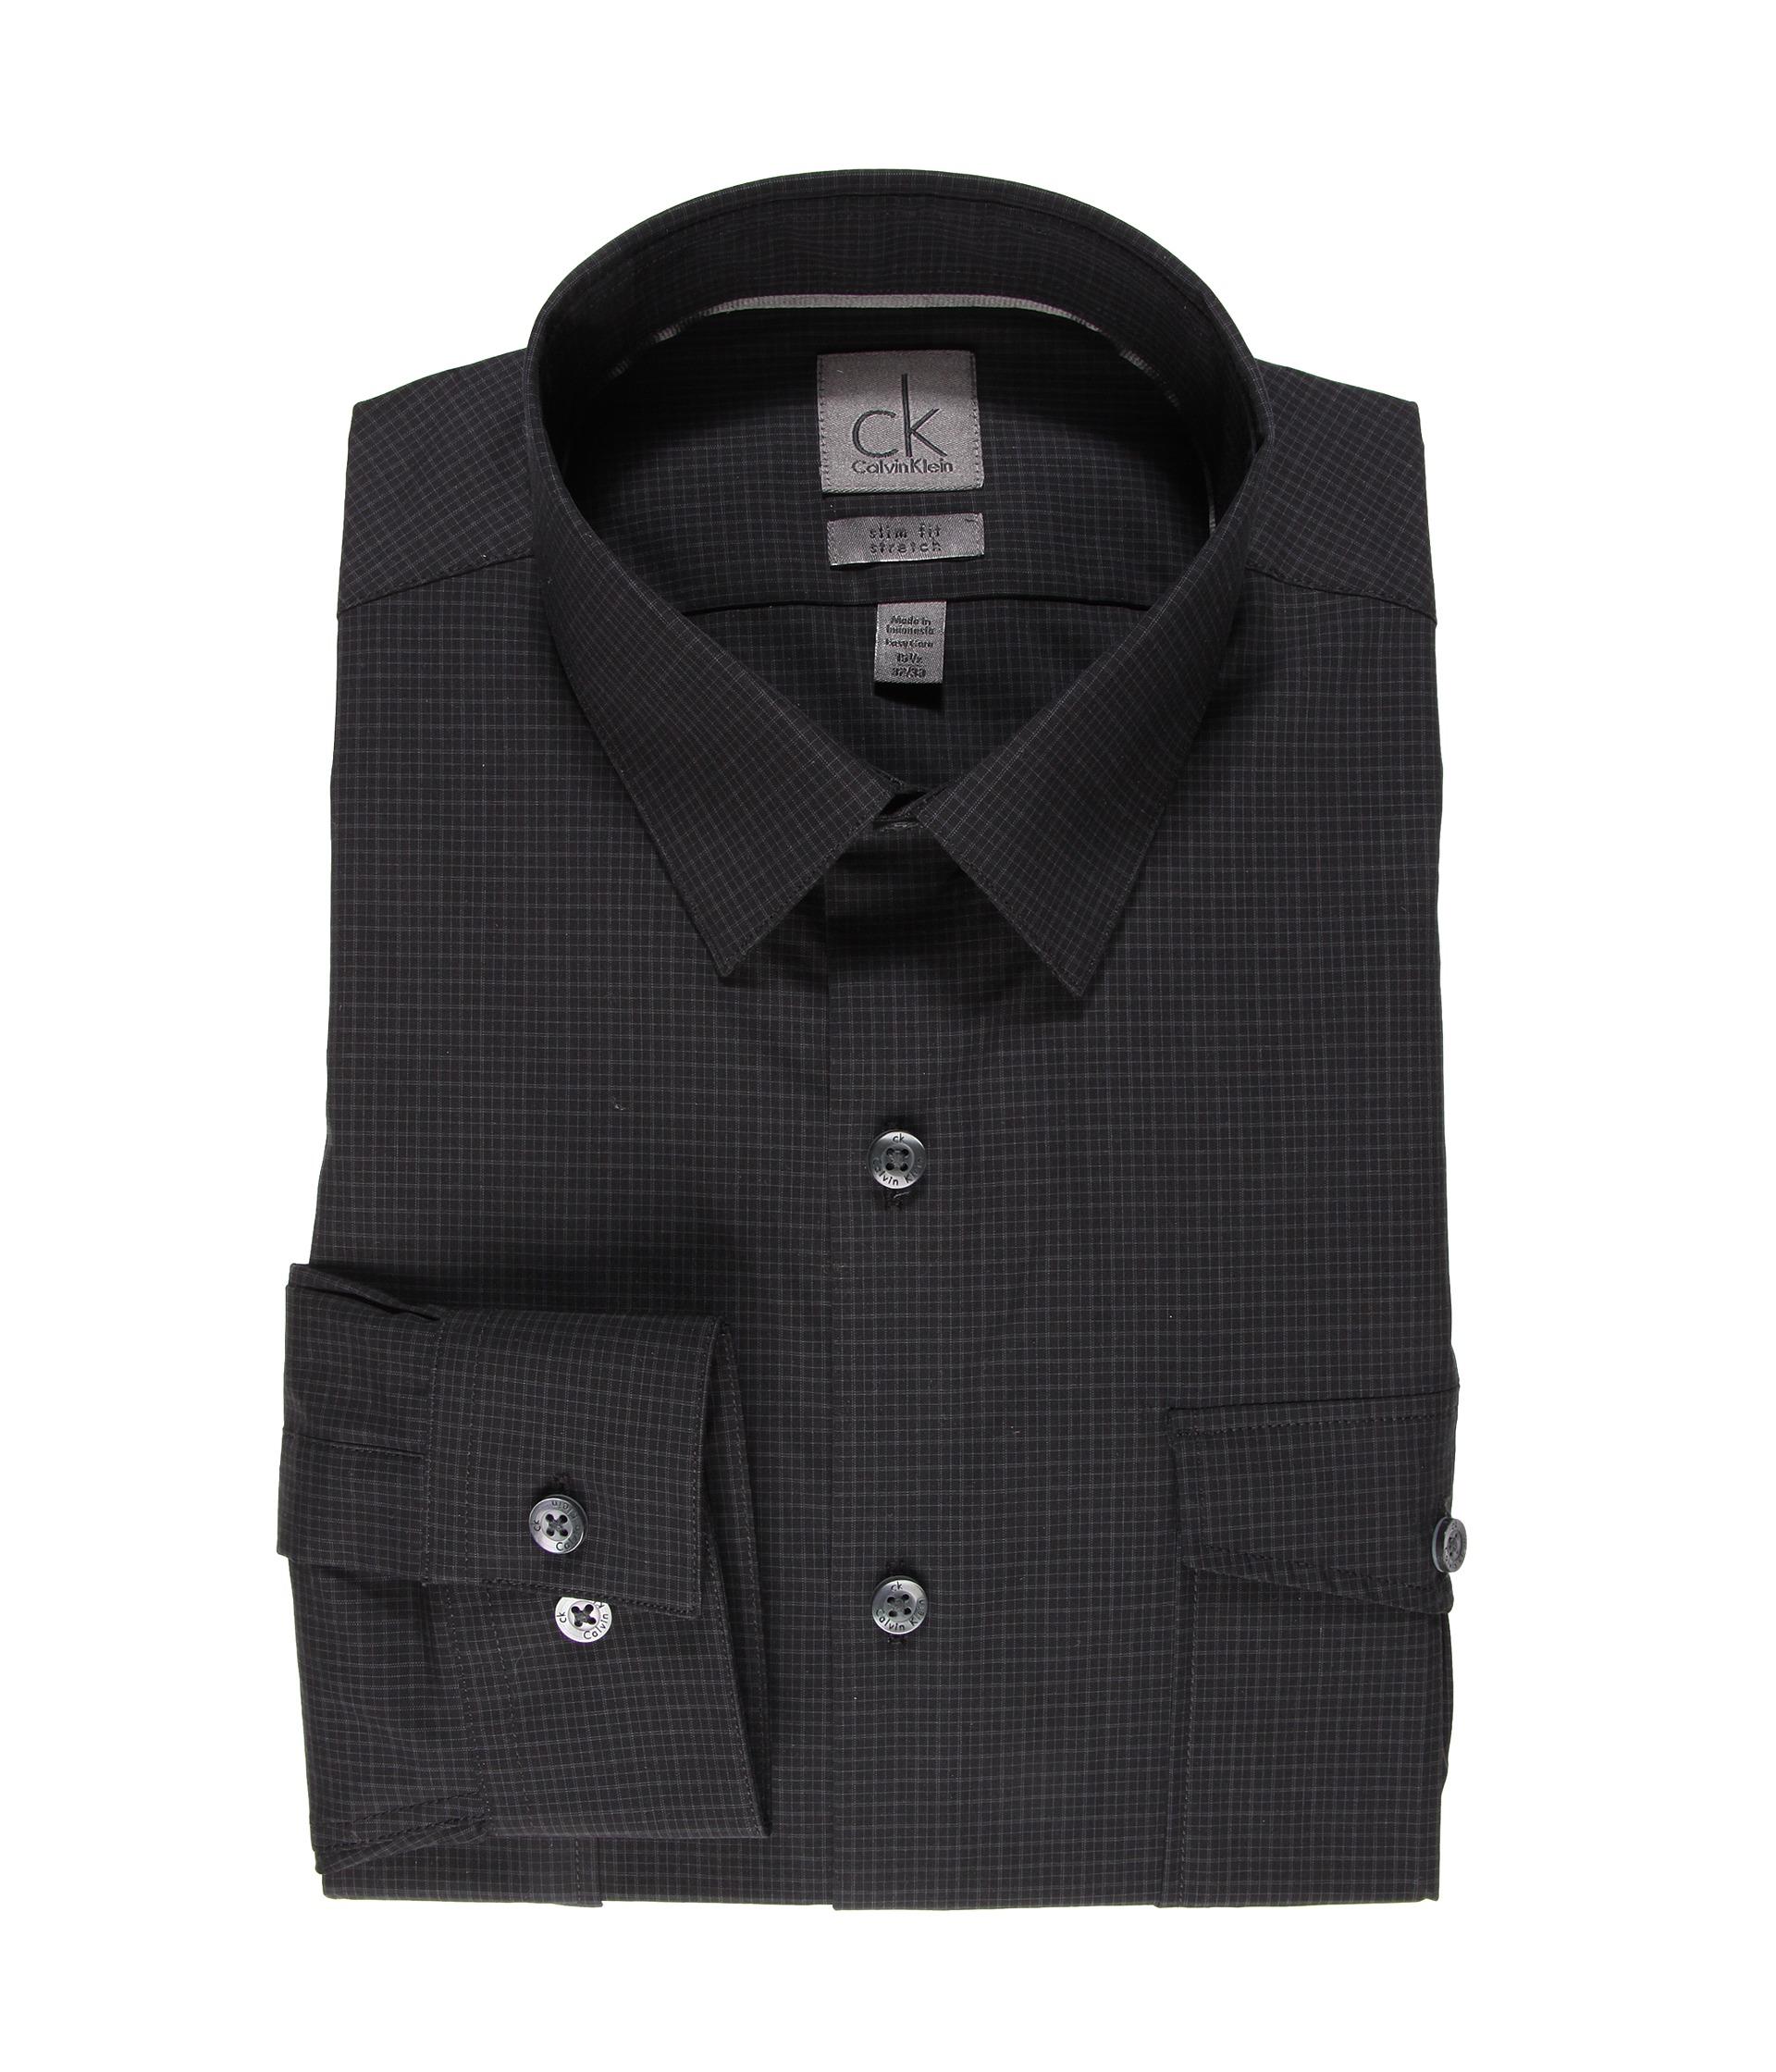 Calvin klein slim fit two pocket l s dress shirt shipped for Calvin klein x fit dress shirt